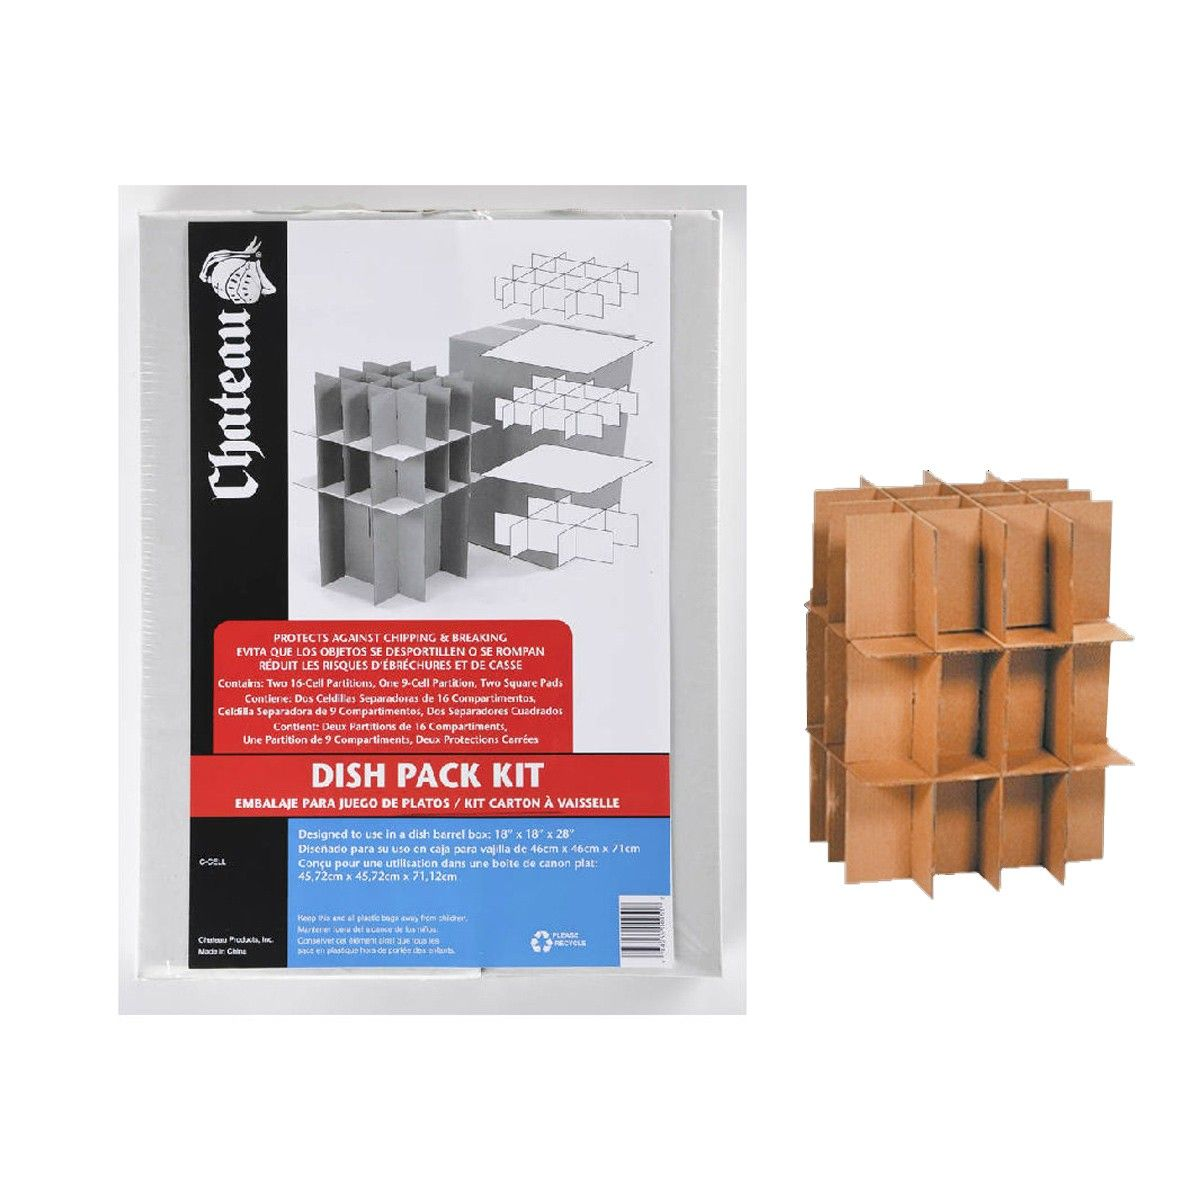 Dish Amp Amp Glass Pack Partition Kit 4 Sets Amp Nbsp Each